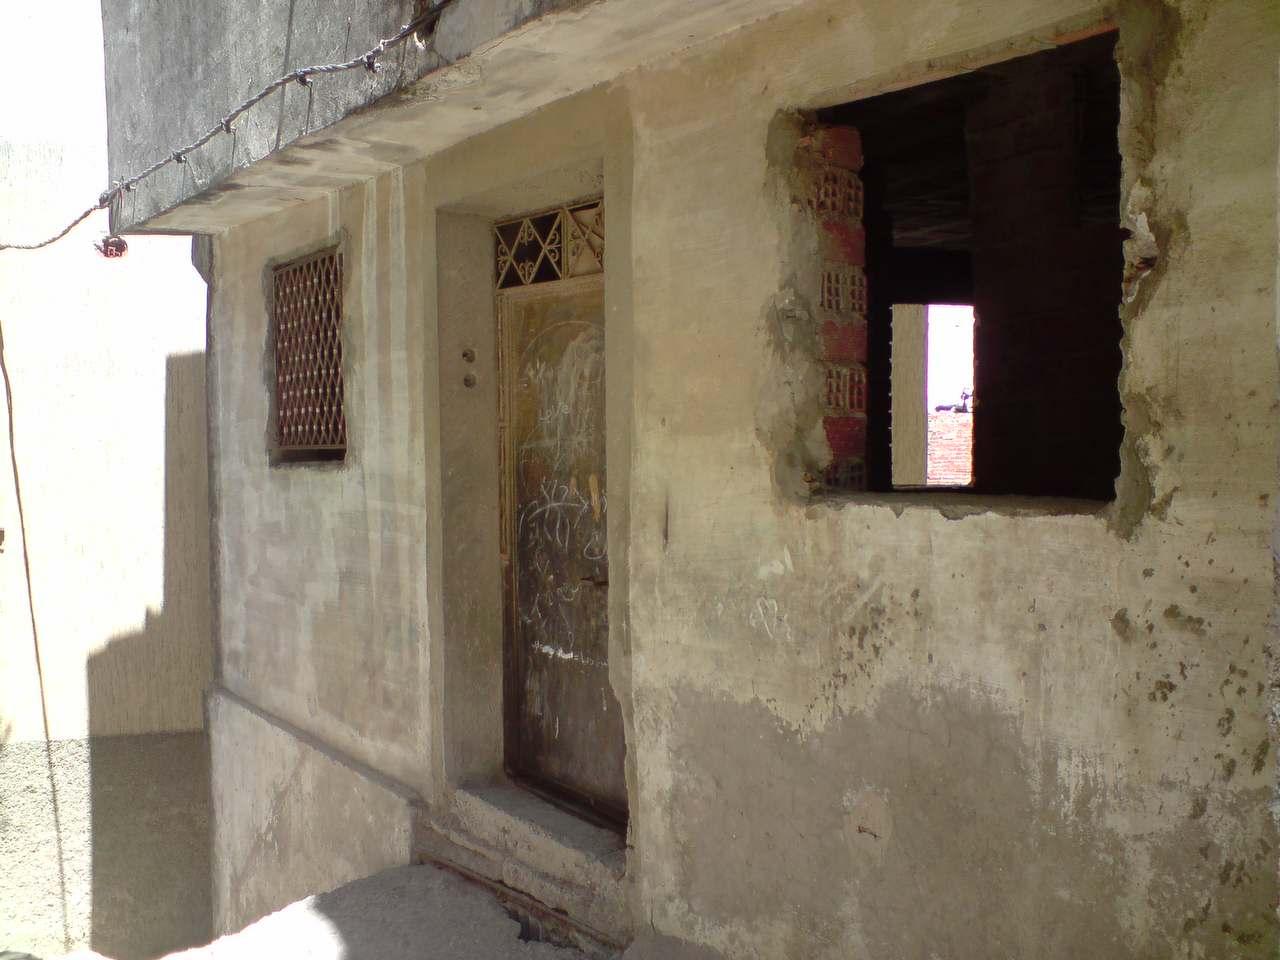 vente maison tanger maroc semi fini maison vendre tanger pas cher. Black Bedroom Furniture Sets. Home Design Ideas